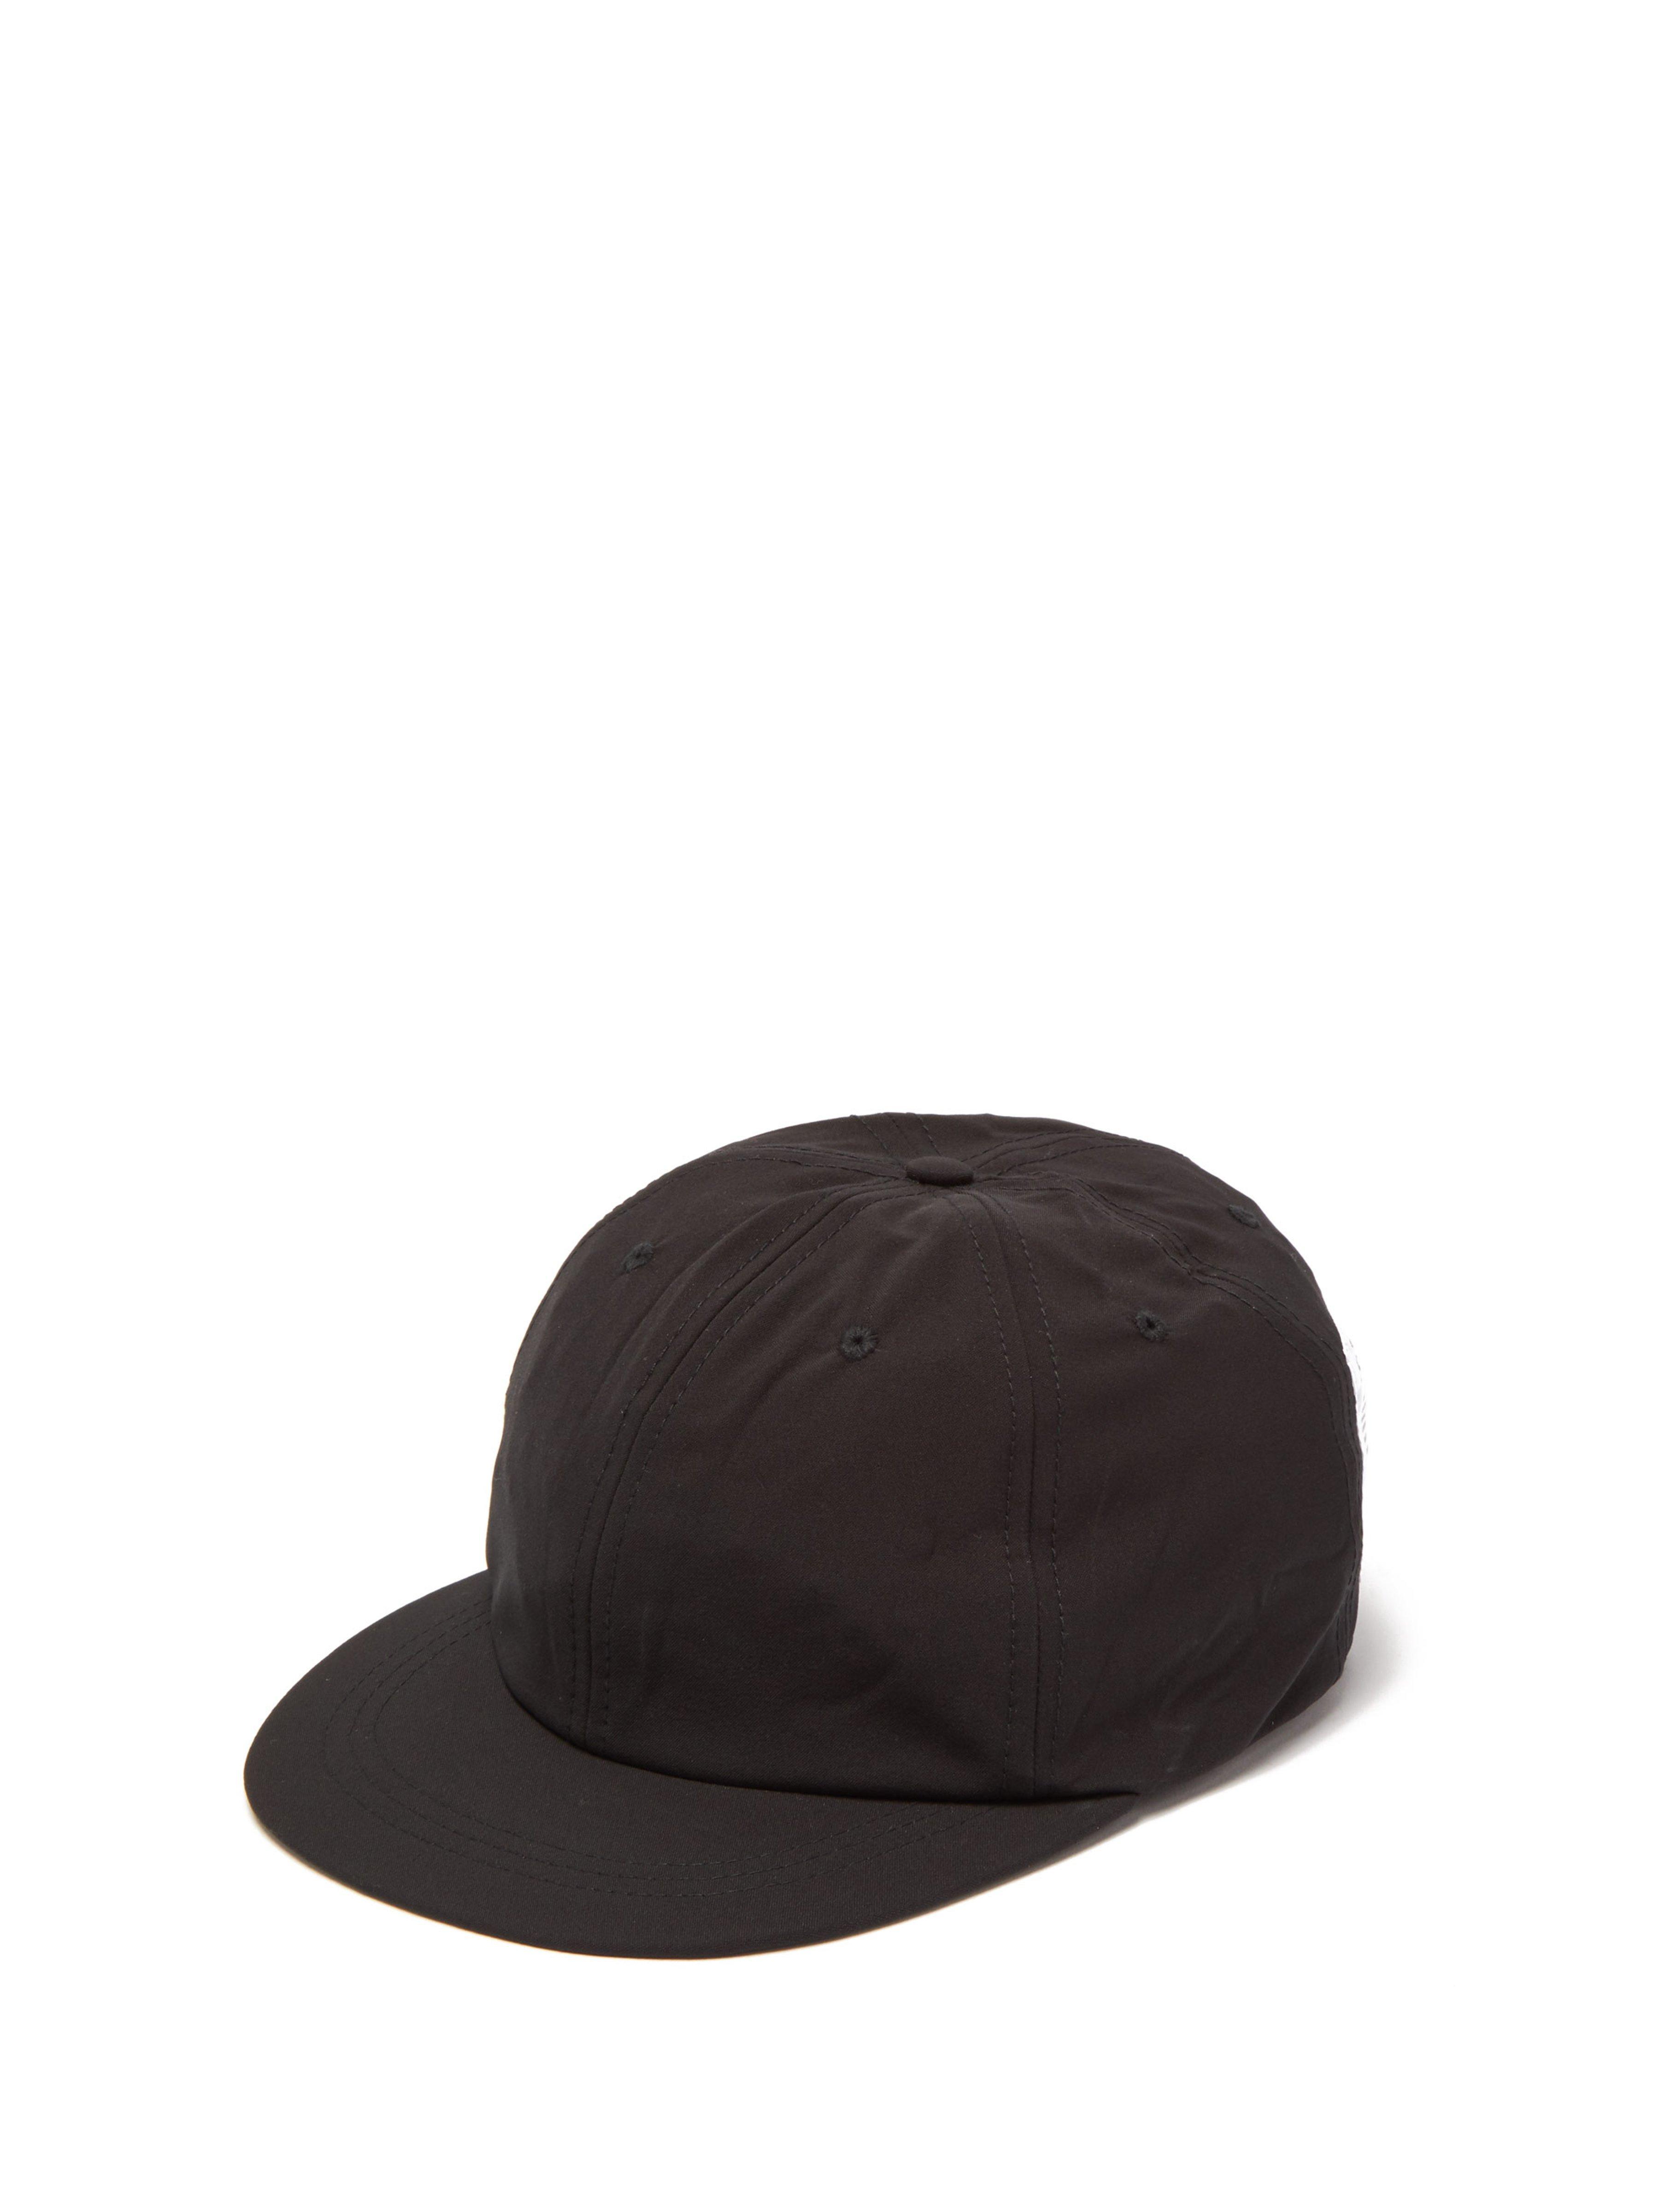 97649a72724 Satisfy - Black Cordura Running Cap for Men - Lyst. View fullscreen